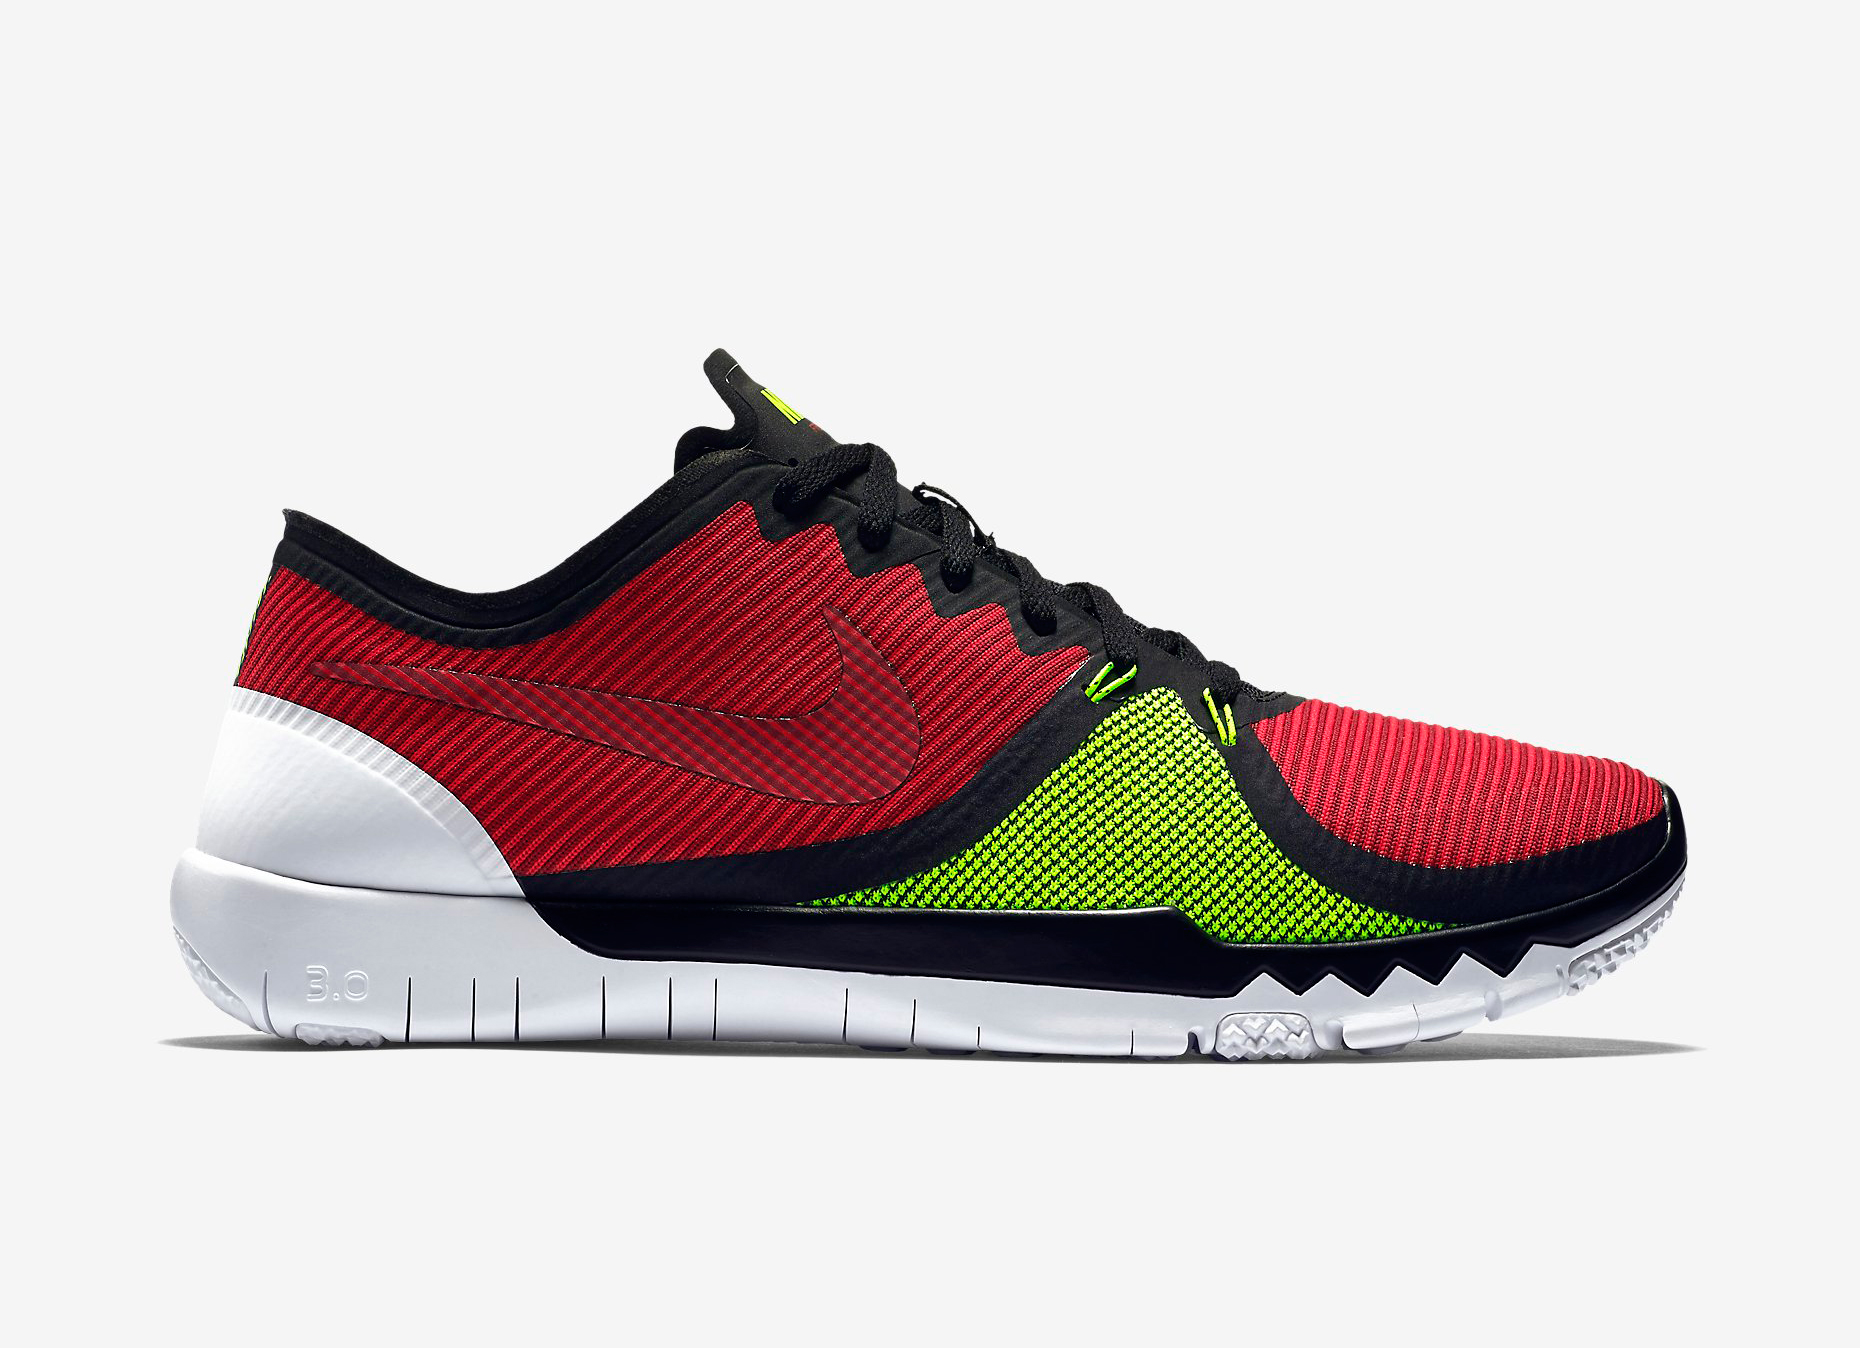 carro Derribar Perdóneme  The Nike Free Trainer 3.0 V4 Men's Training Shoe - Fashion Trendsetter